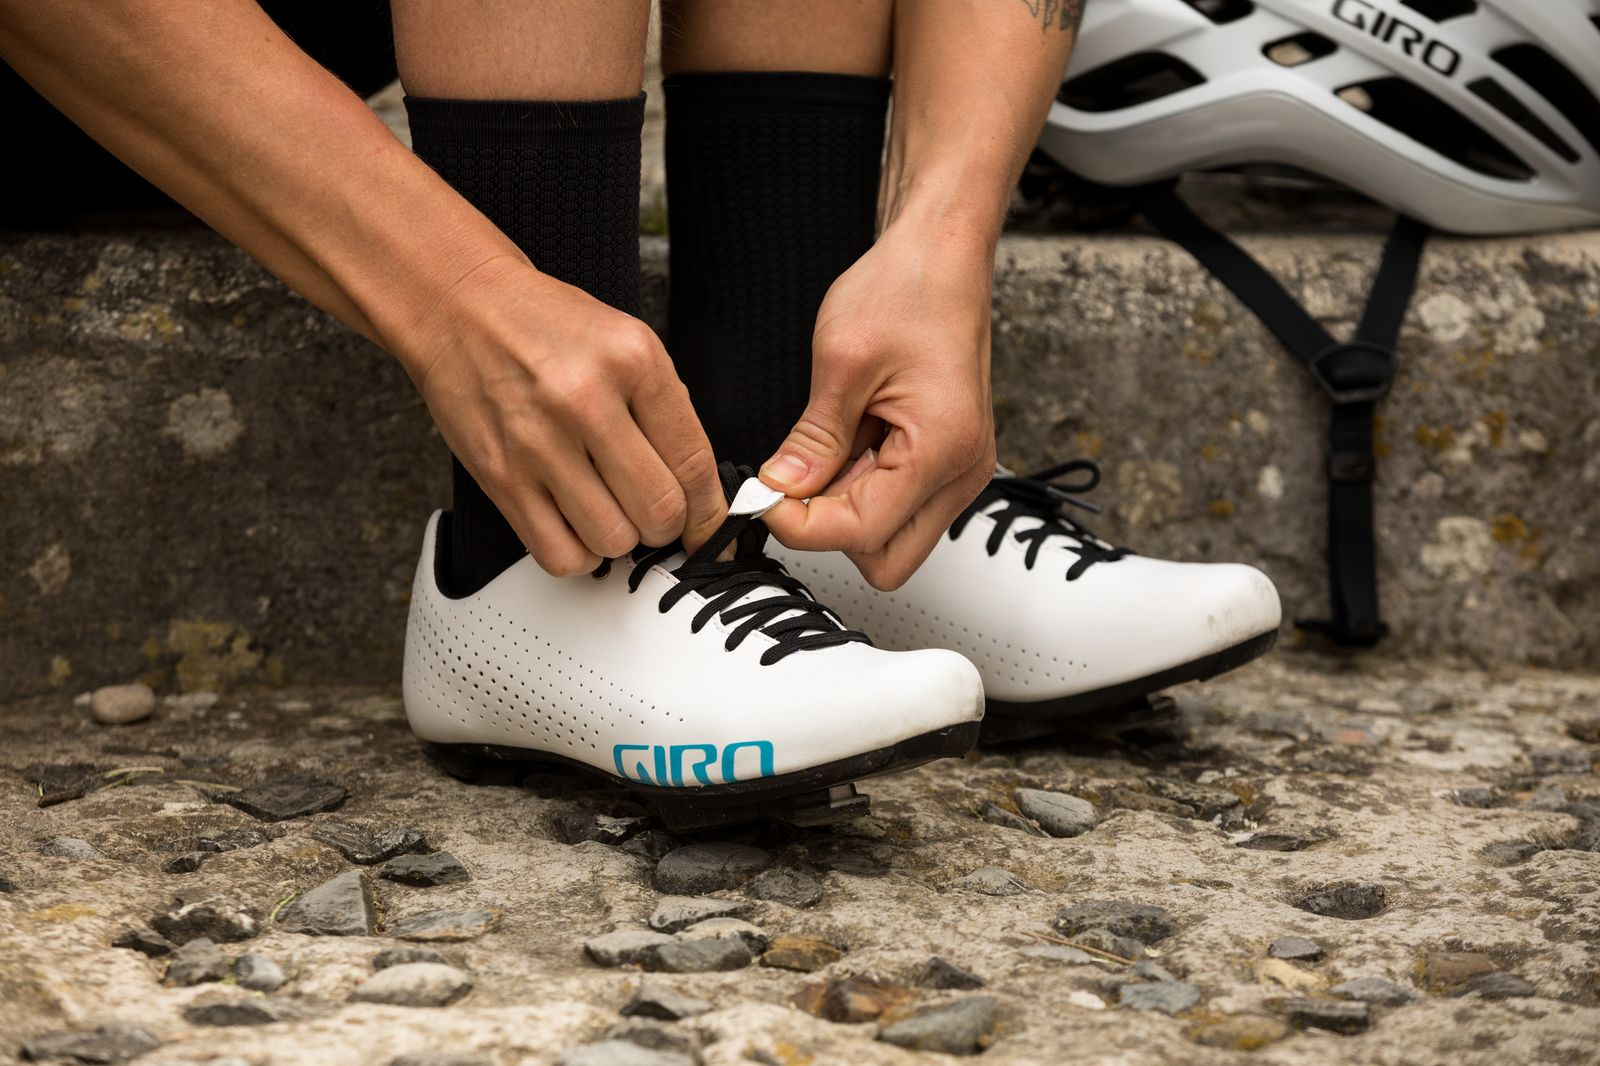 Best women's road shoes: Giro Empire